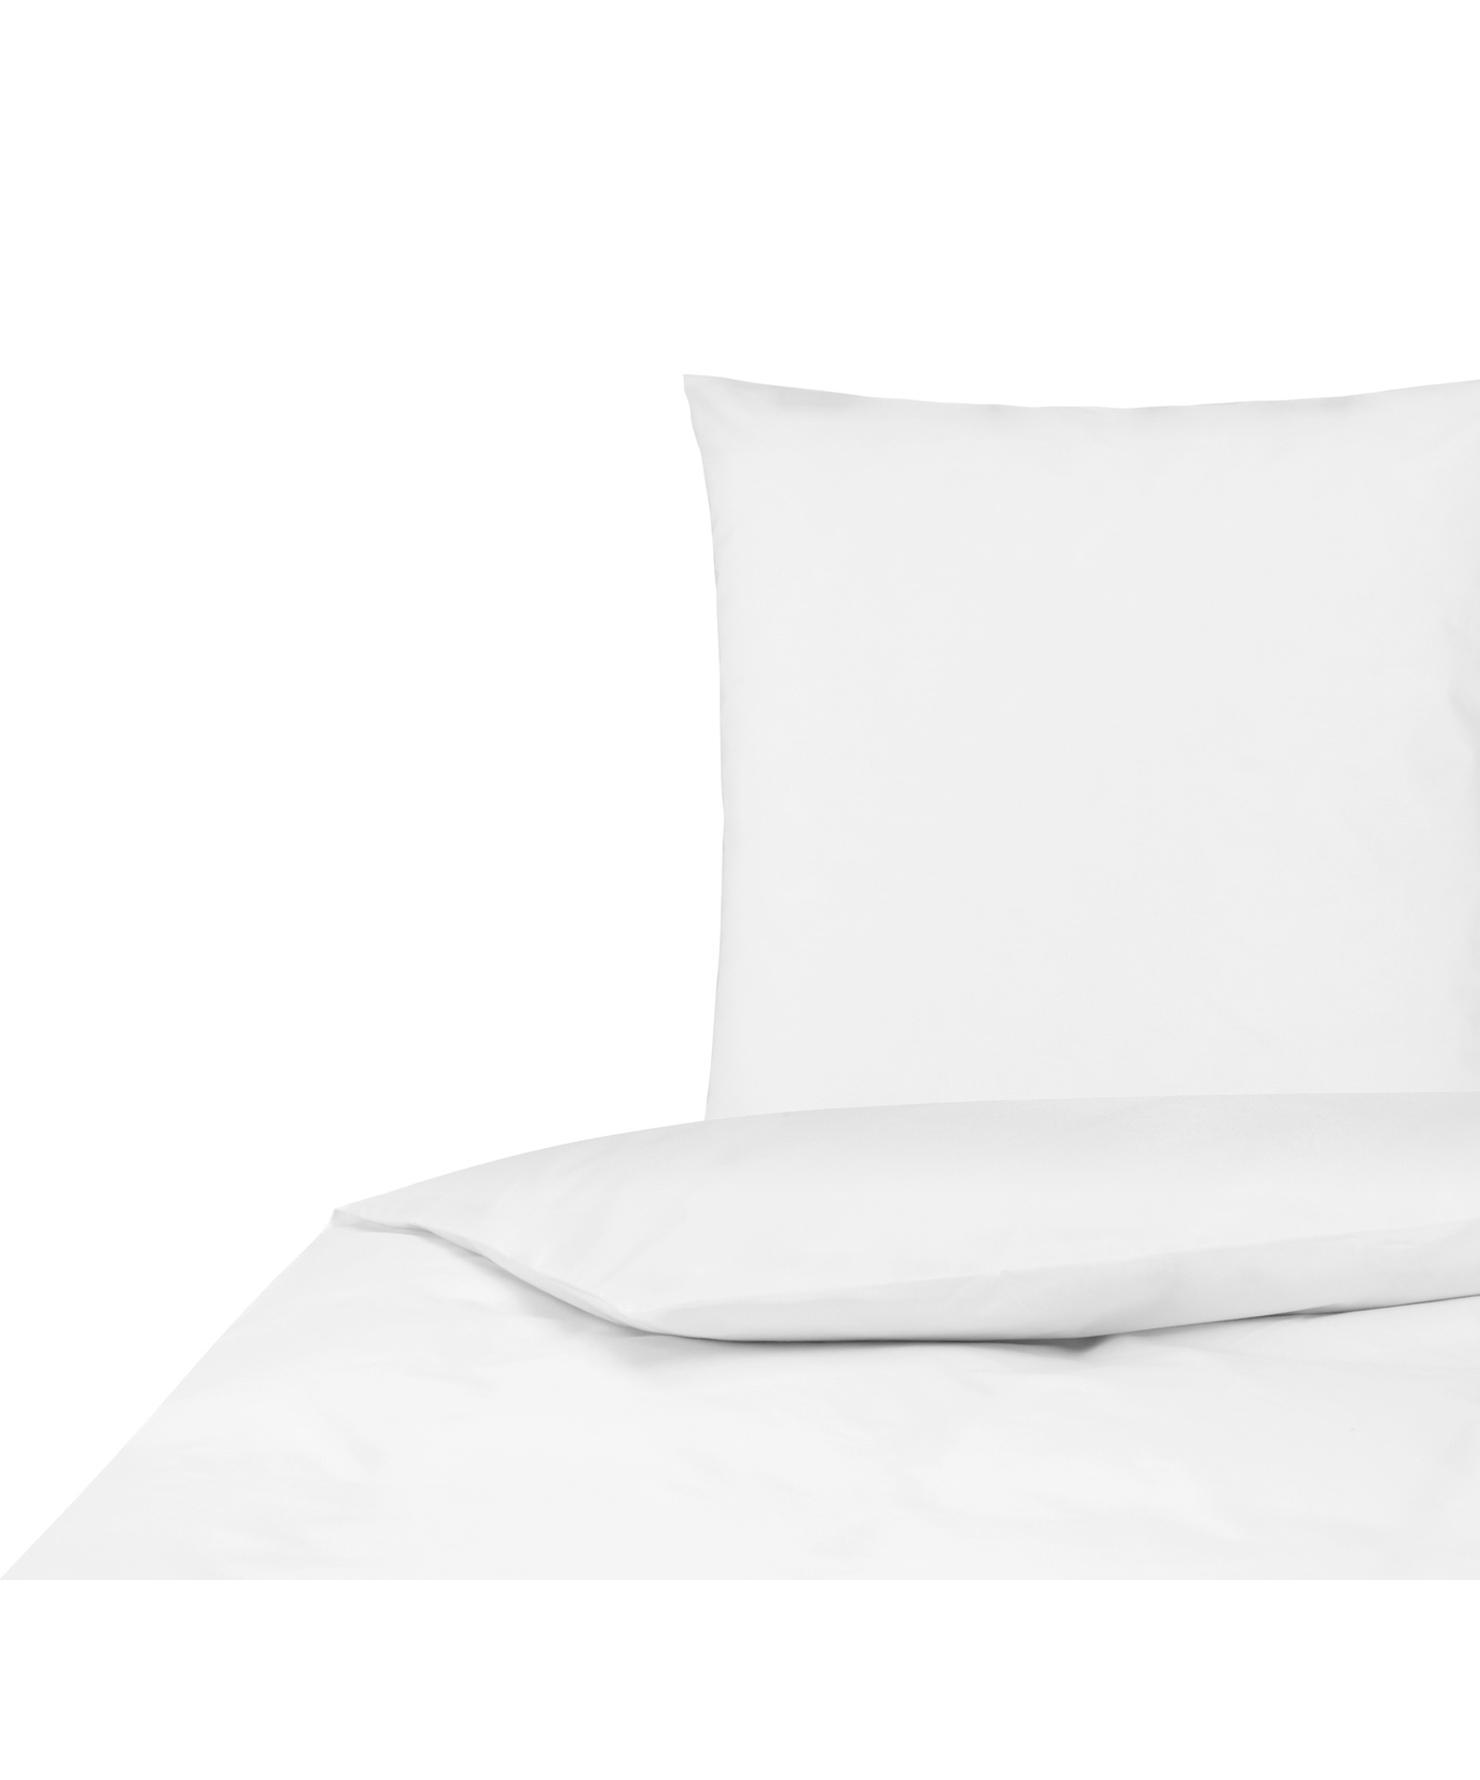 Baumwollperkal-Bettwäsche Elsie in Weiß, Webart: Perkal Fadendichte 200 TC, Weiß, 155 x 220 cm + 1 Kissen 80 x 80 cm